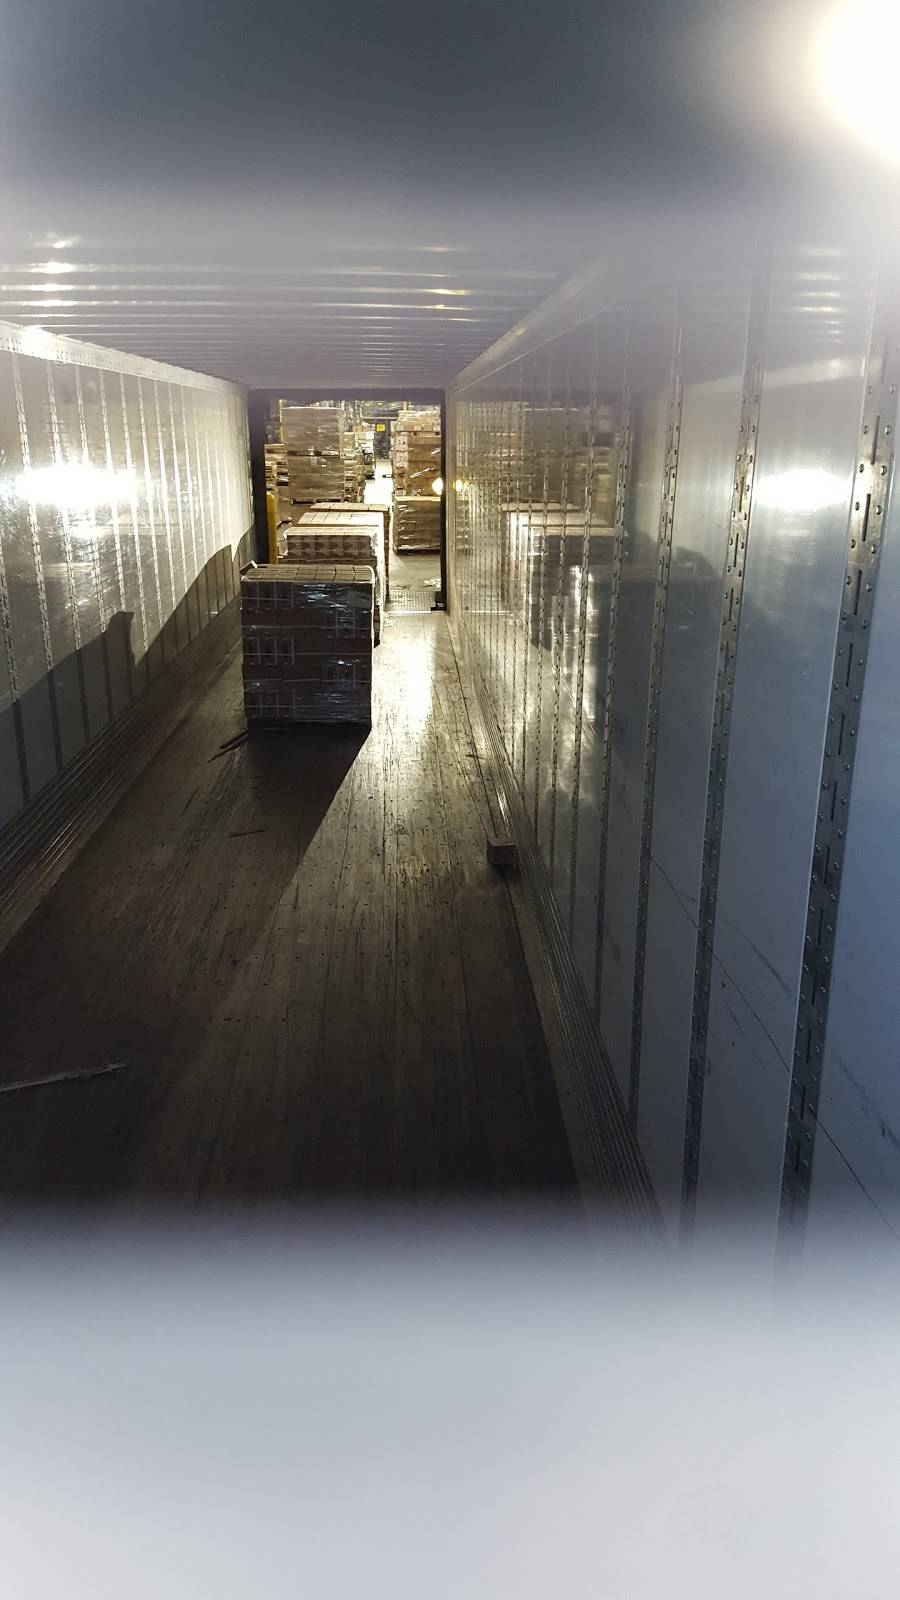 Windigo Logistics - storage    Photo 7 of 9   Address: 11025 Charter Oak Ranch Rd, Fountain, CO 80817, USA   Phone: (719) 382-1800